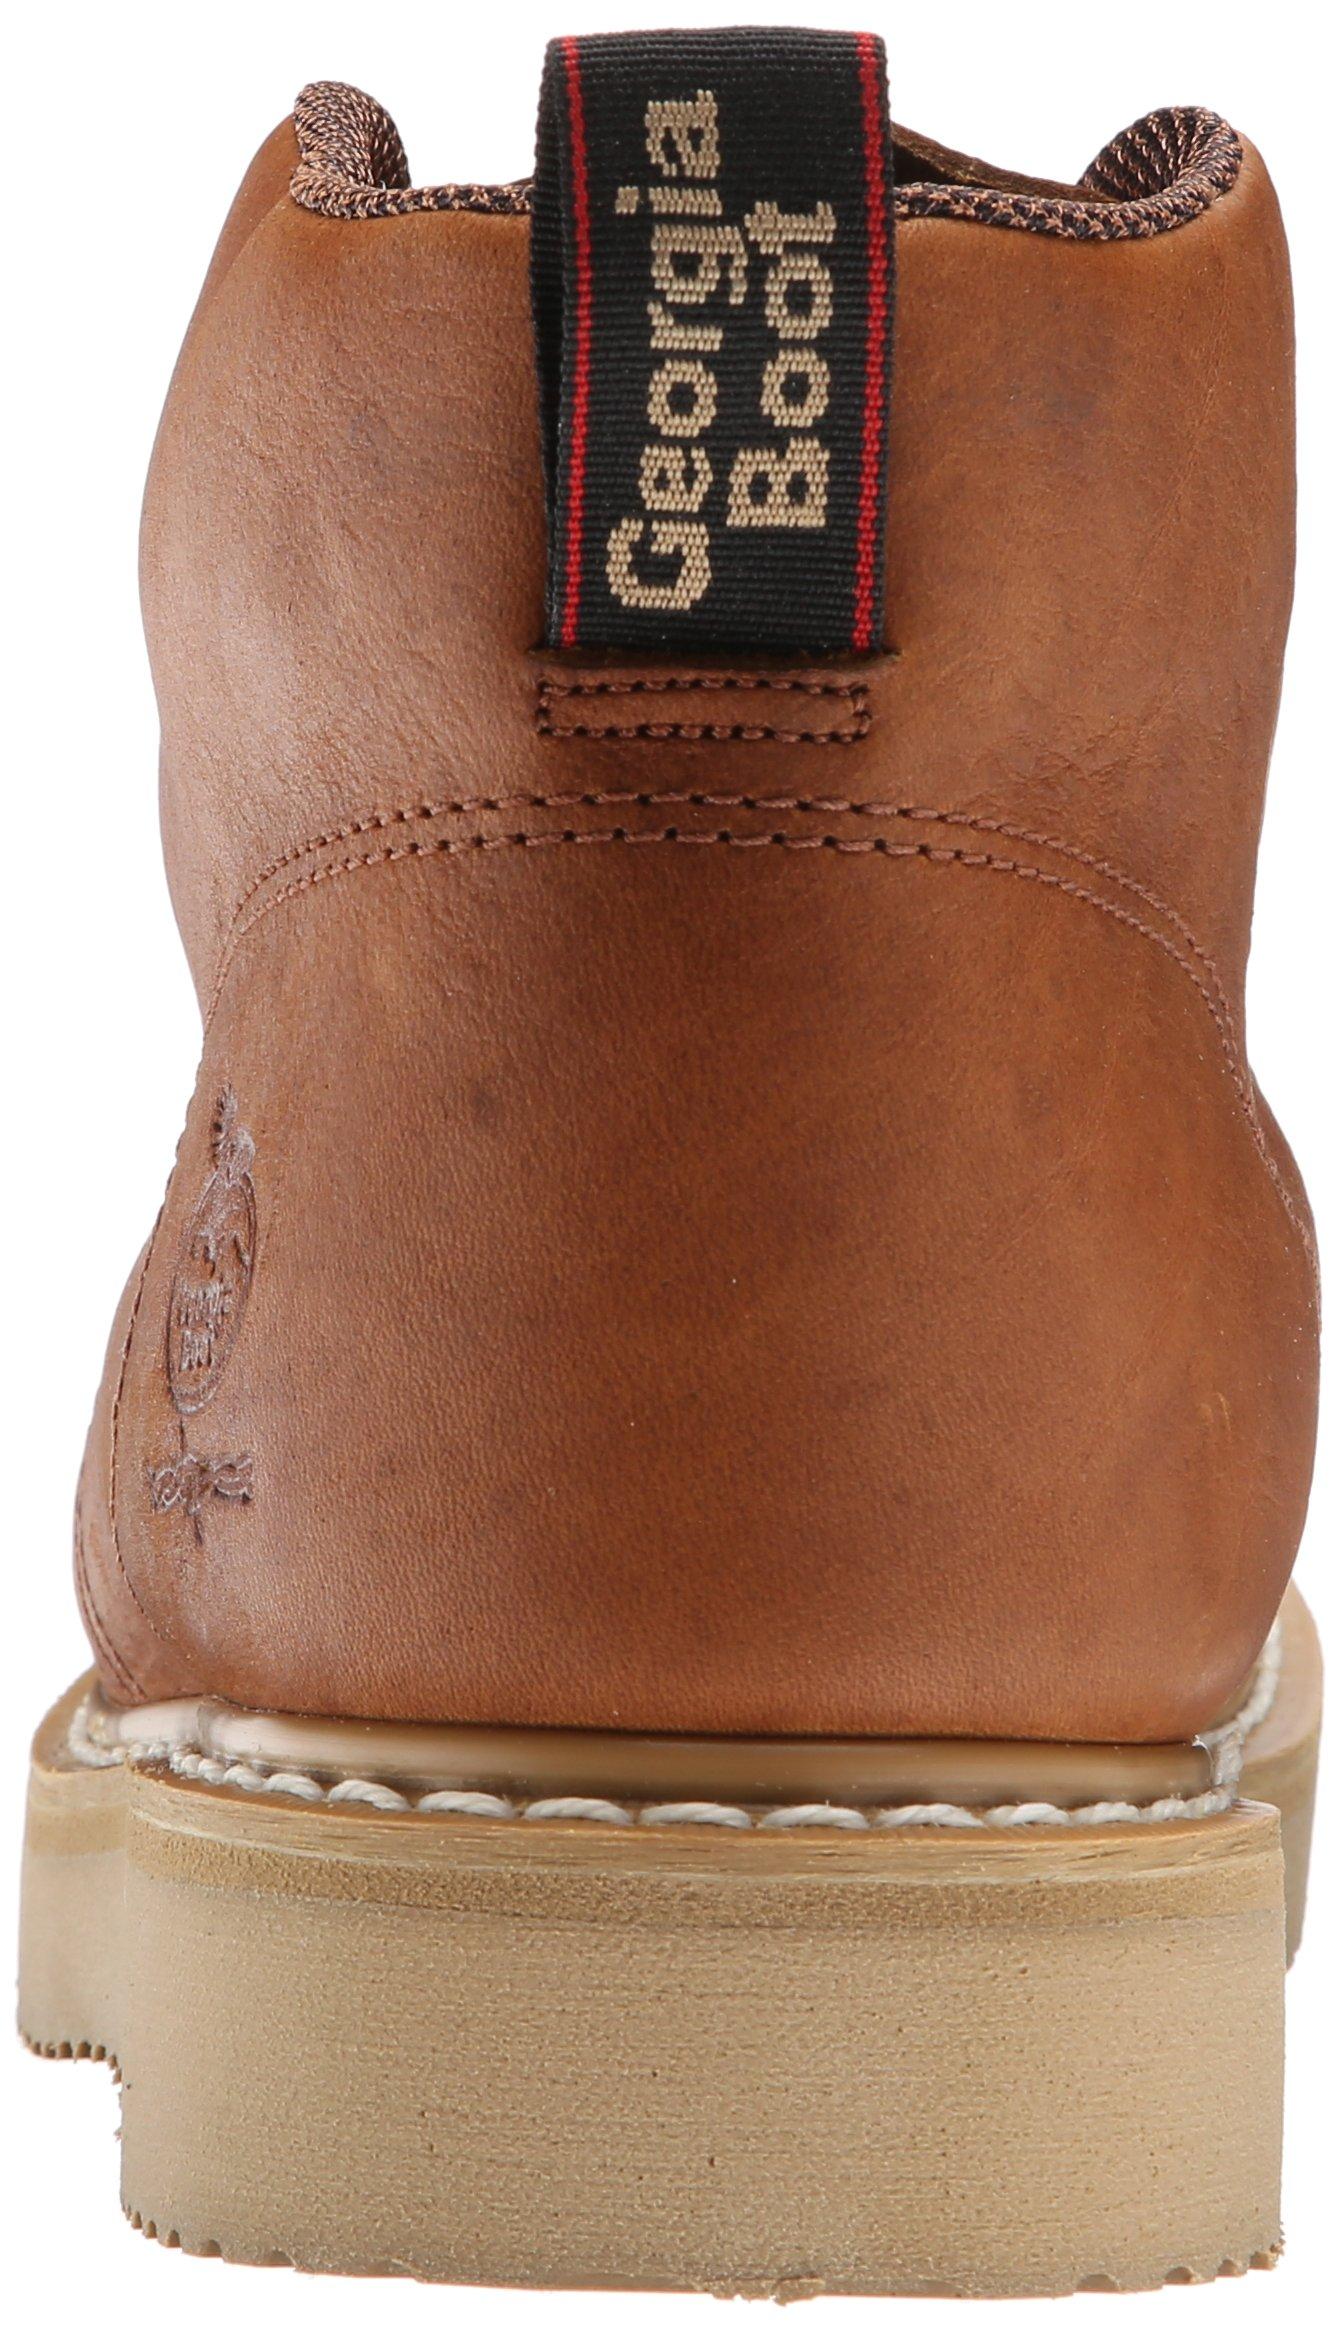 Georgia Boot Men's GB1222 Chukka Boot,Barracuda Gold,9.5 W US by Georgia (Image #2)